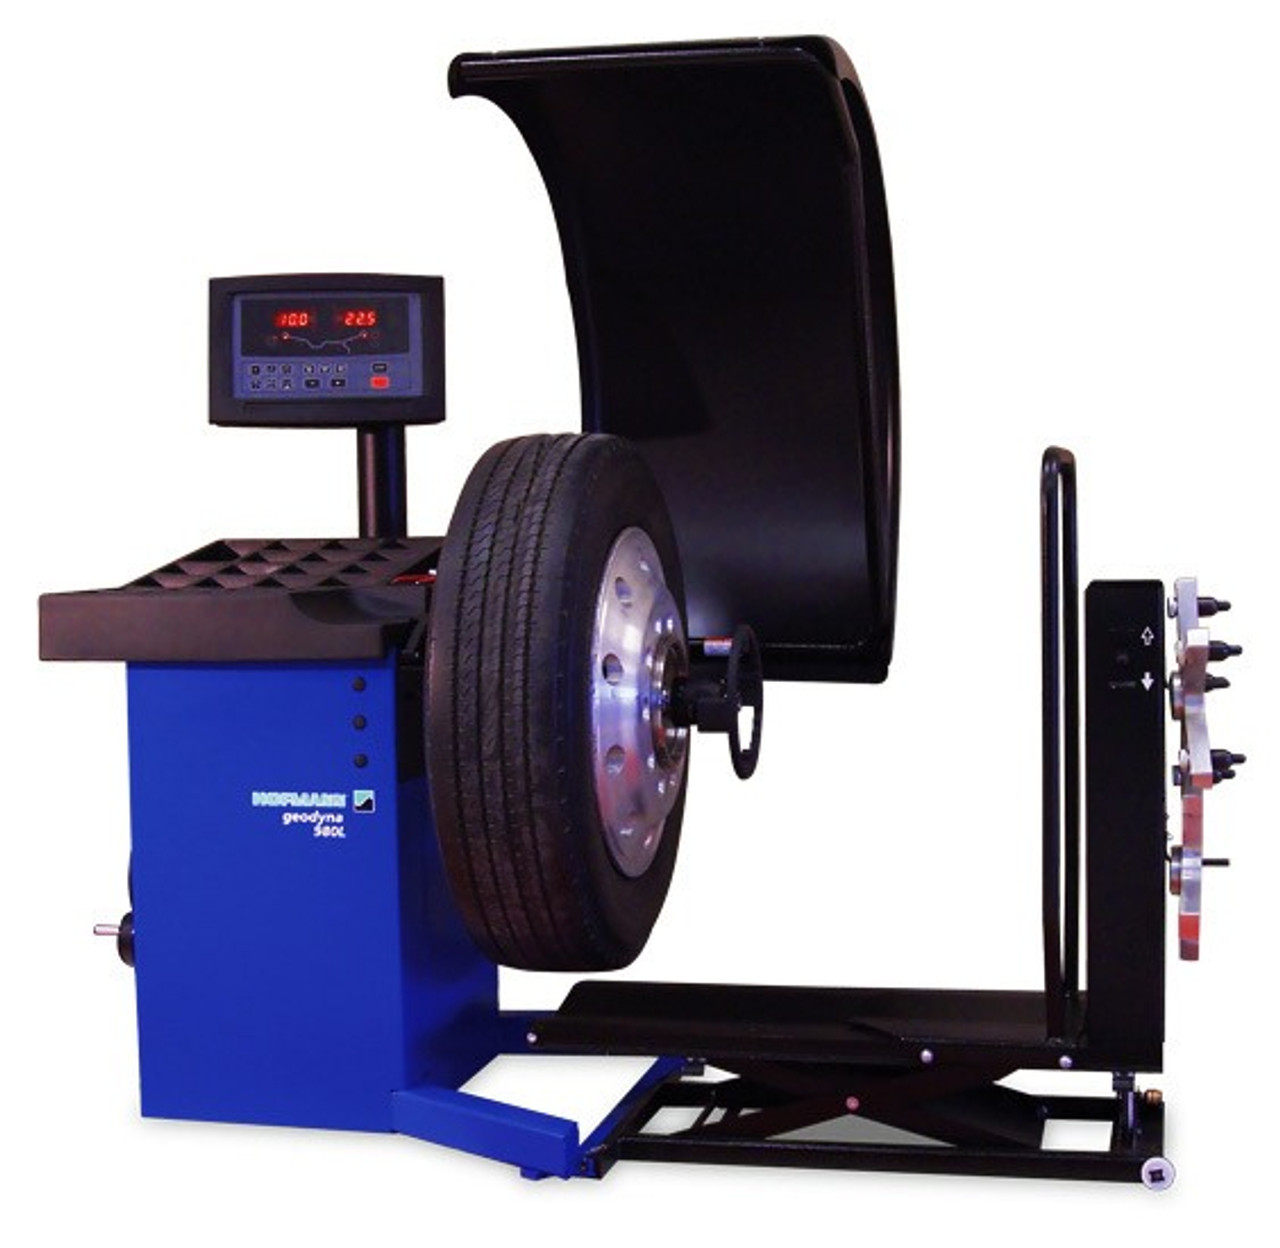 hofmann geodyna 980l heavy duty wheel balancer rh jmcautomotiveequipment com hofmann geodyna 980l service manual